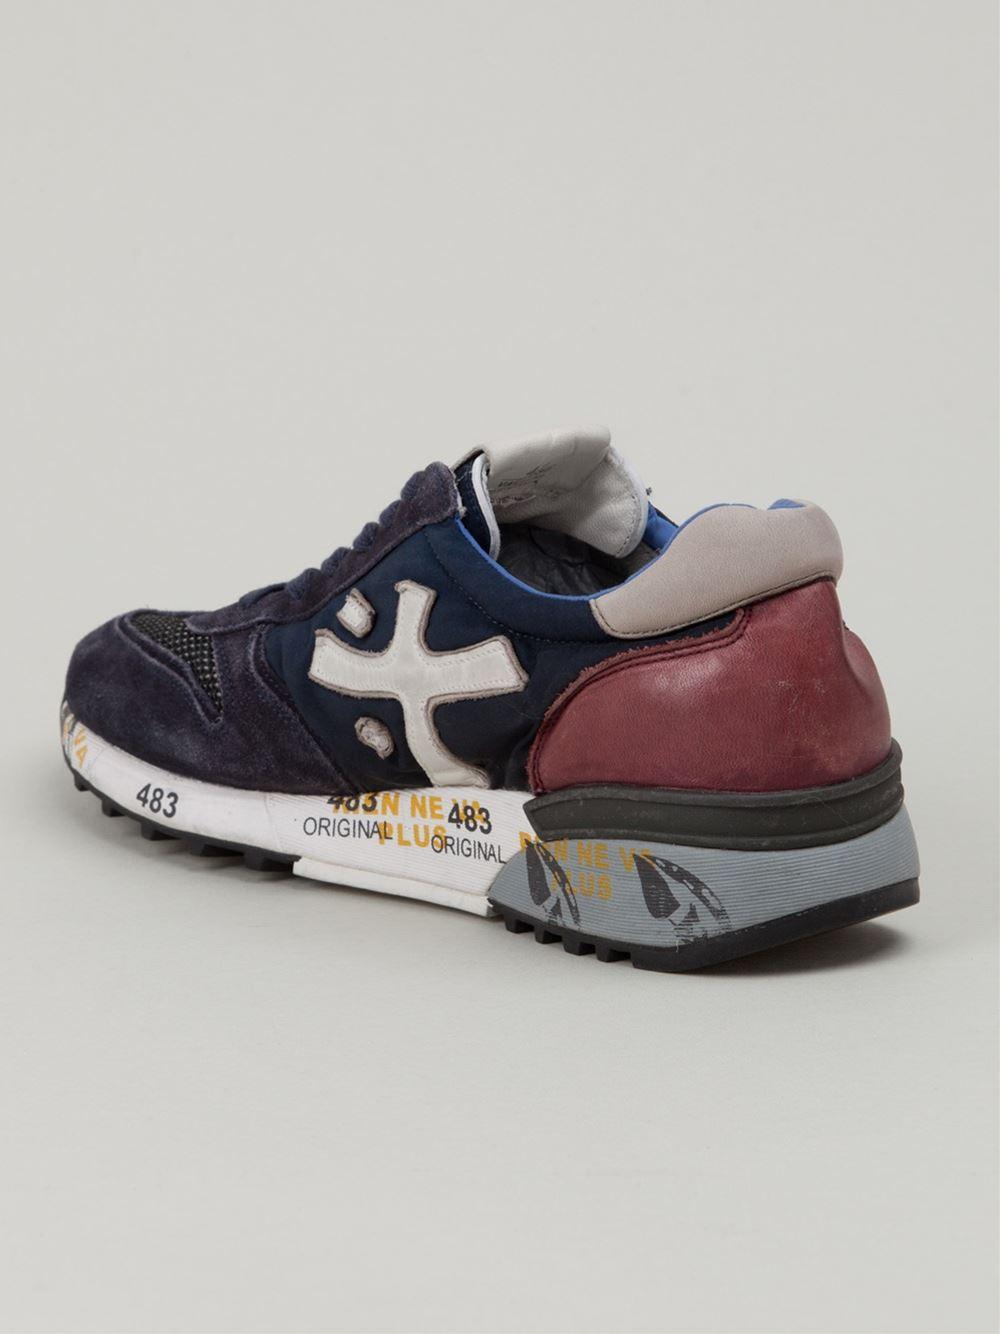 Chaussures De Sport Premiata Mick mCsC2nnT